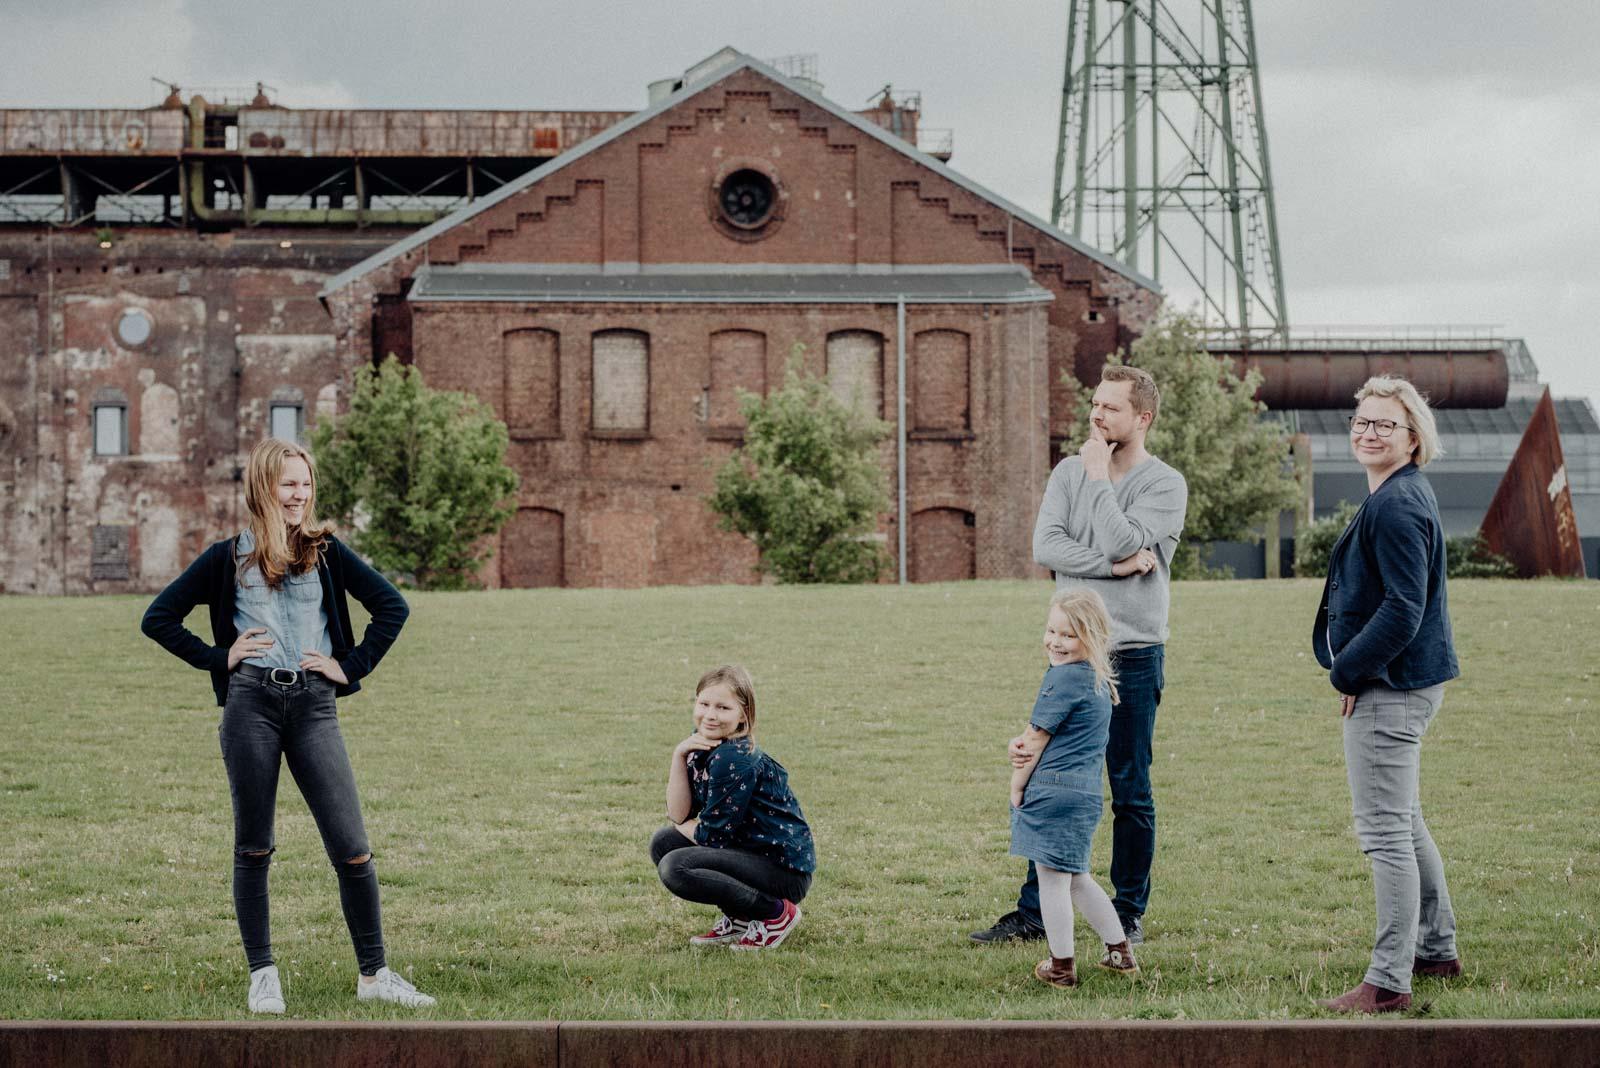 Gebt mir eure beste Vogue-Pose: Prompts Familienshooting.